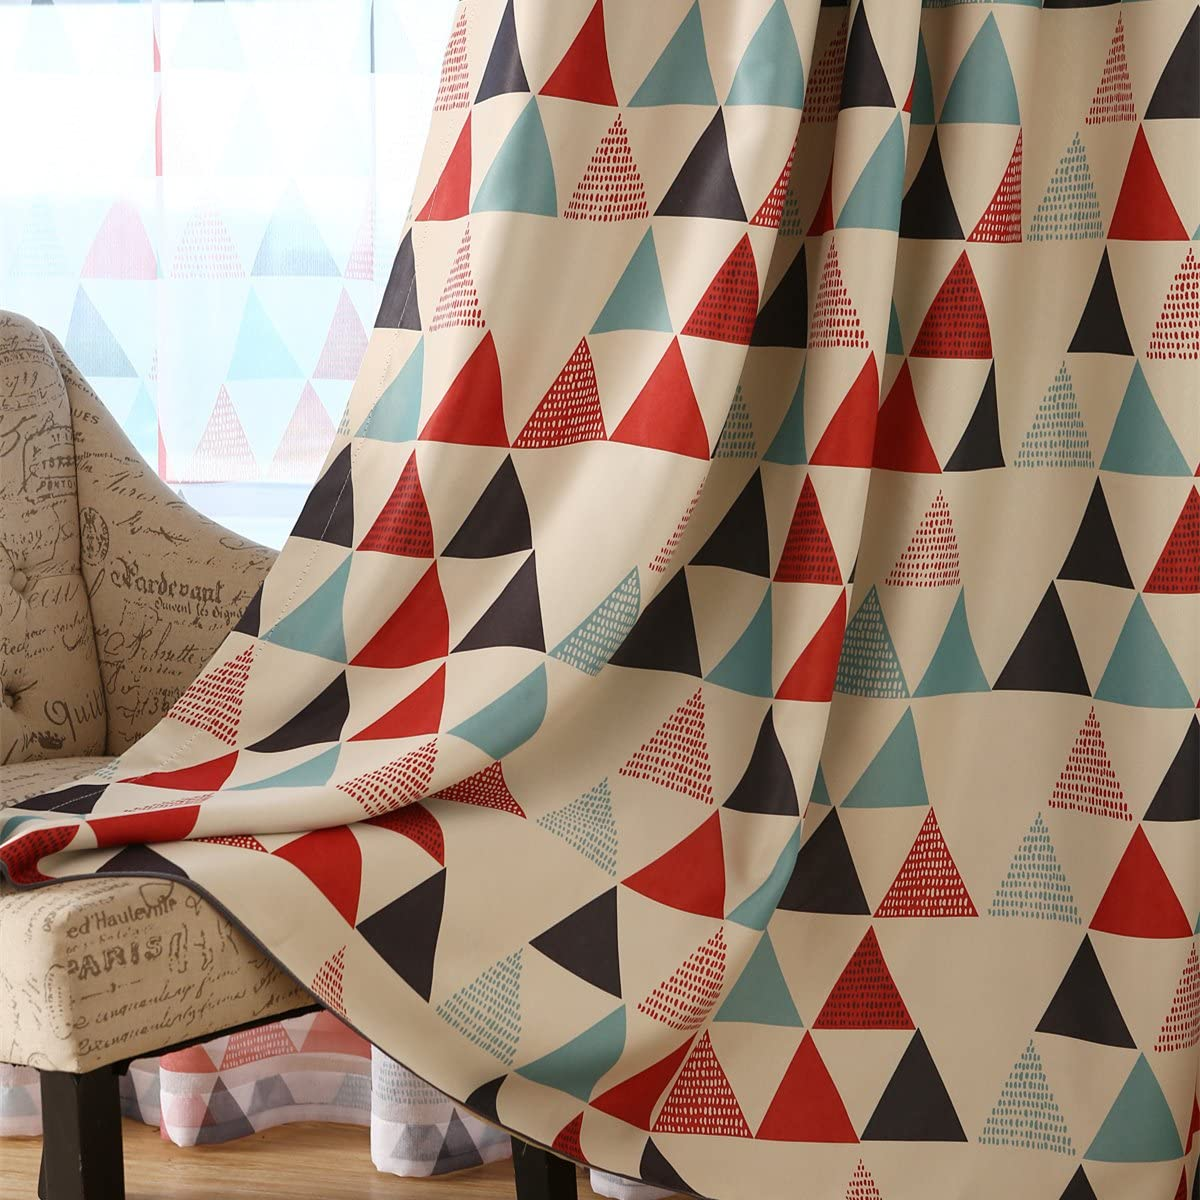 MYRU 1 Pair Geometric Triangle Grommet Top Room Darkening Curtains for Boys Girls Kids Room 54 Width by 63 Length X 2, Red